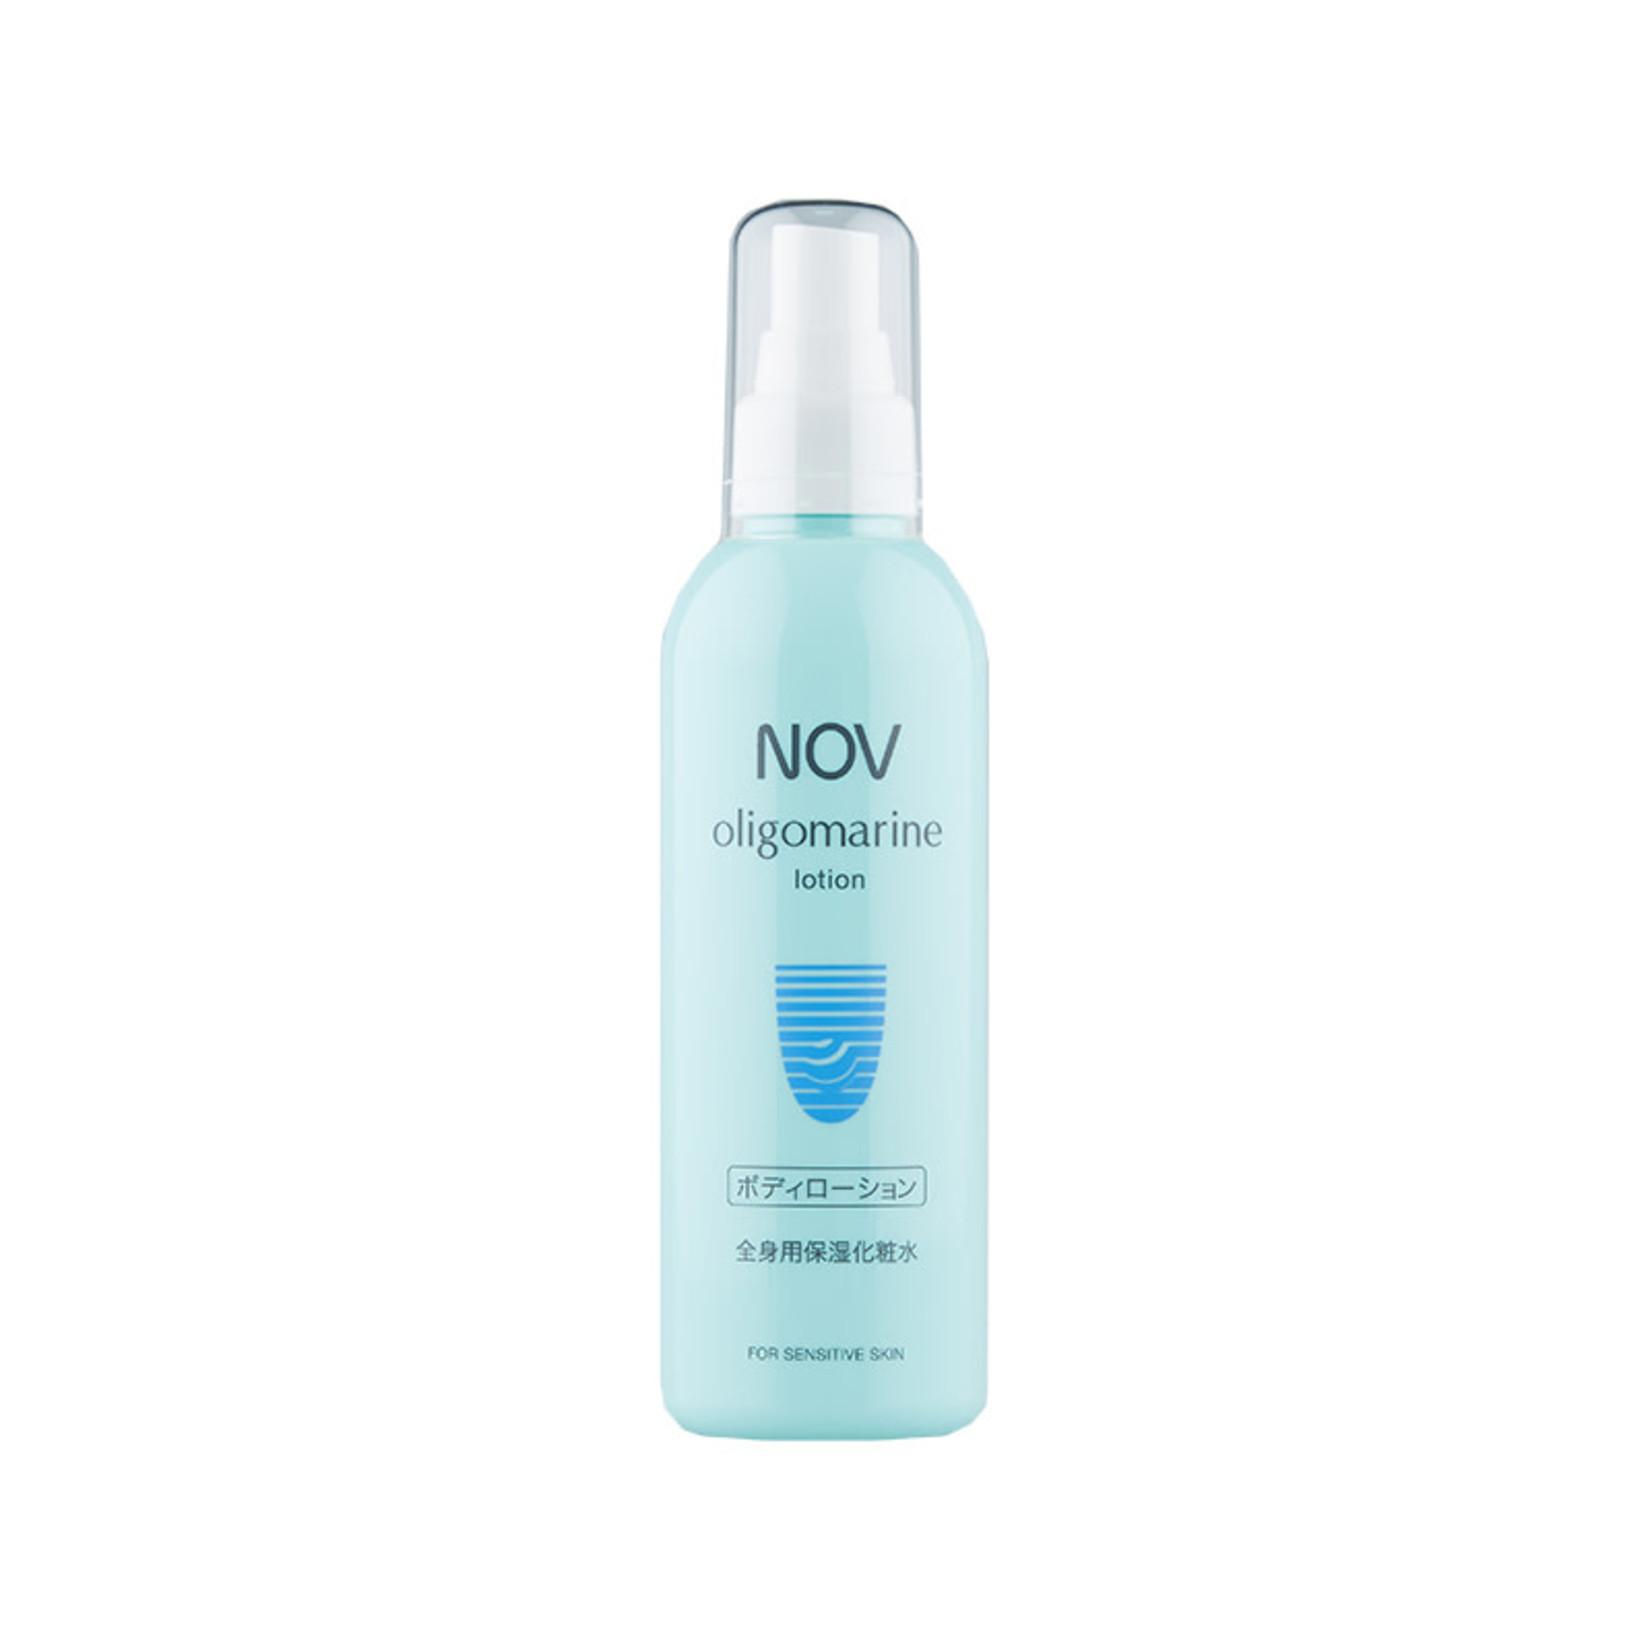 NOV Nov Oligomarine Lotion 190ml